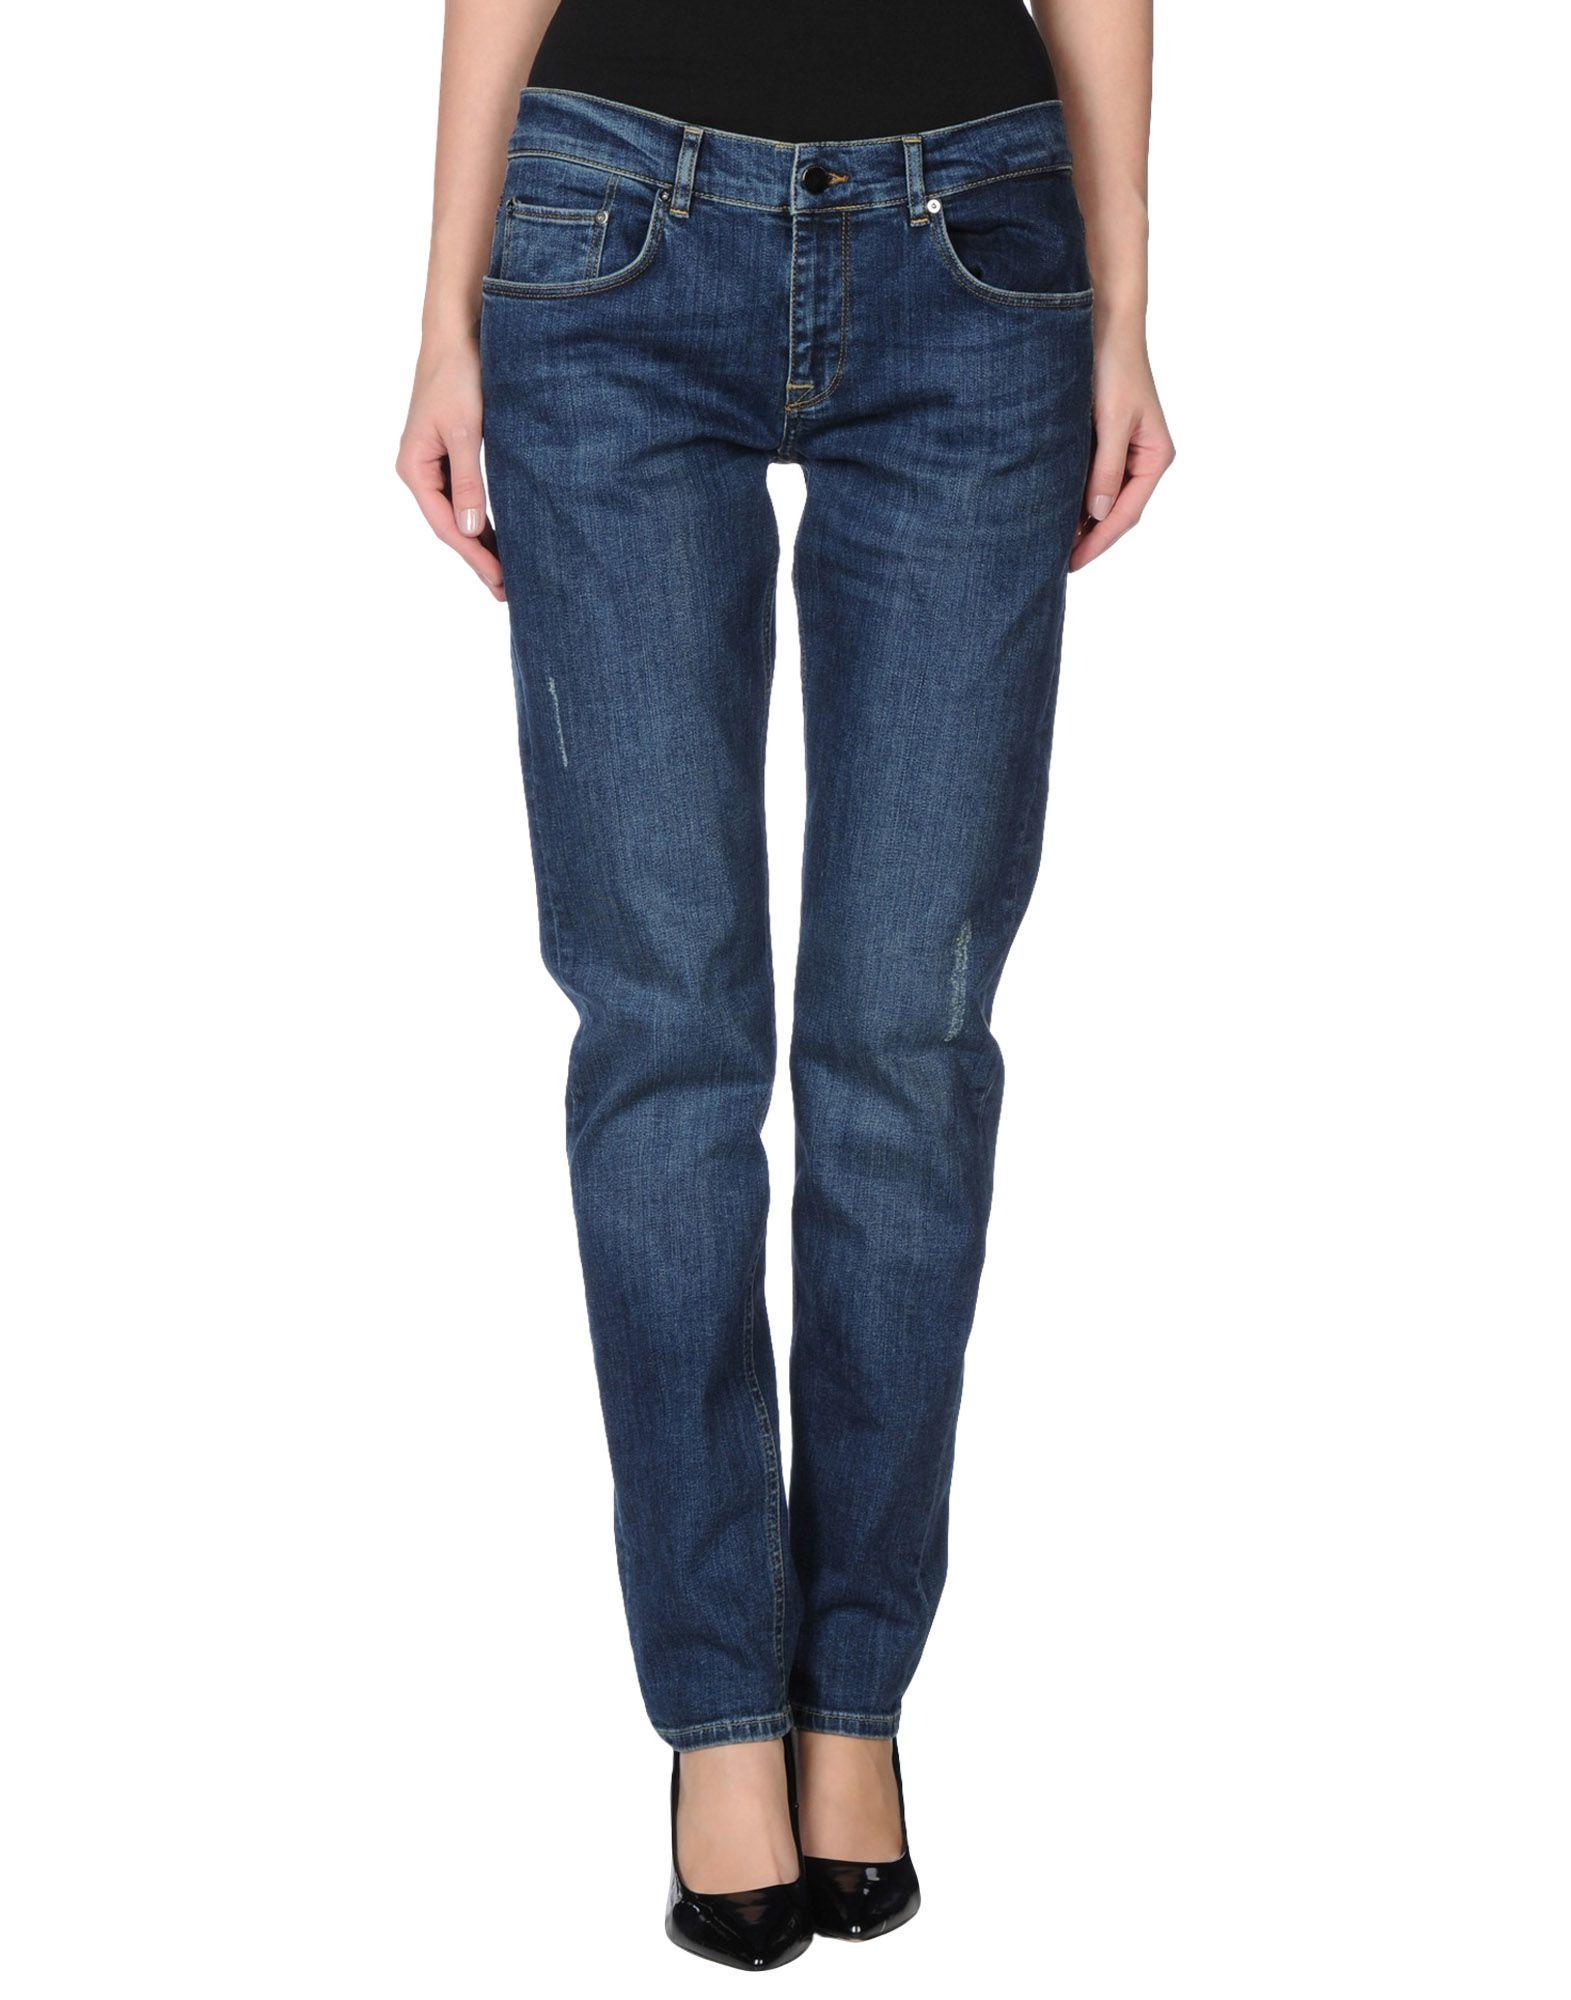 victoria beckham denim trousers in blue save 60 lyst. Black Bedroom Furniture Sets. Home Design Ideas